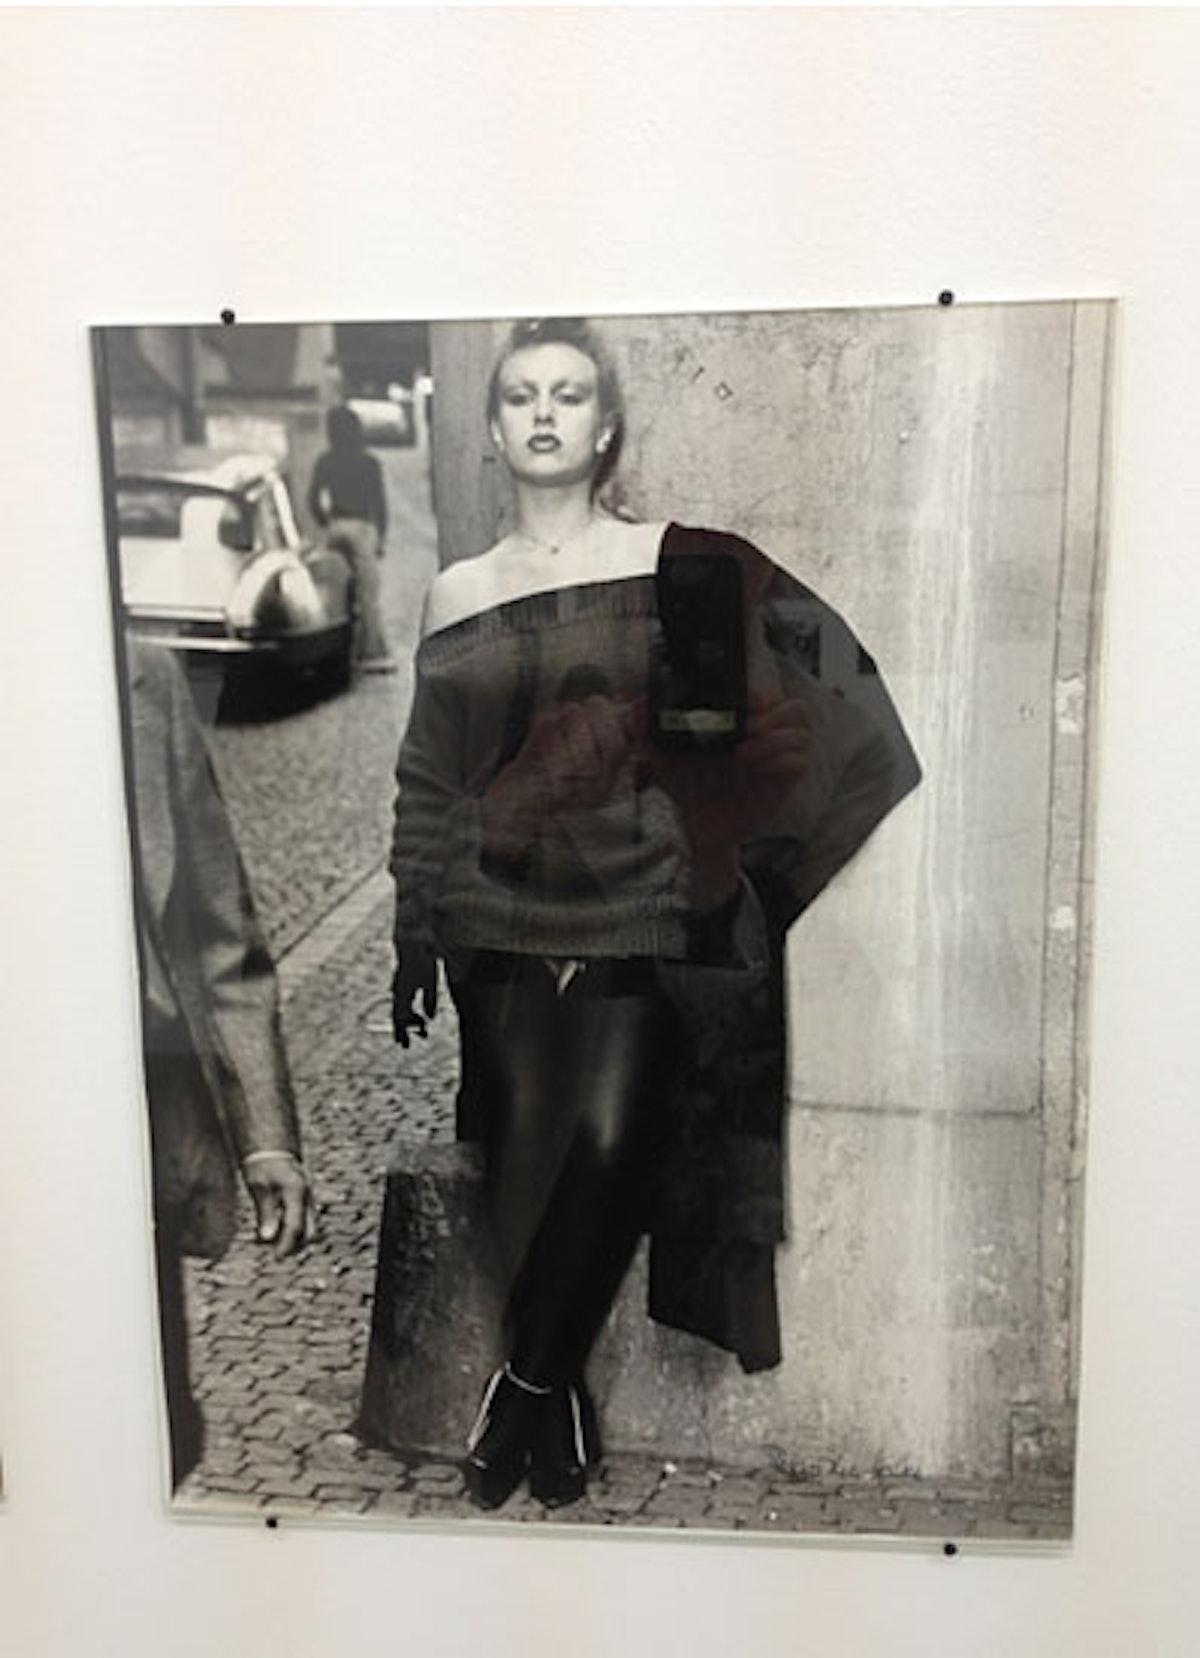 arss-berlin-art-gallery-weekend-03-v.jpg